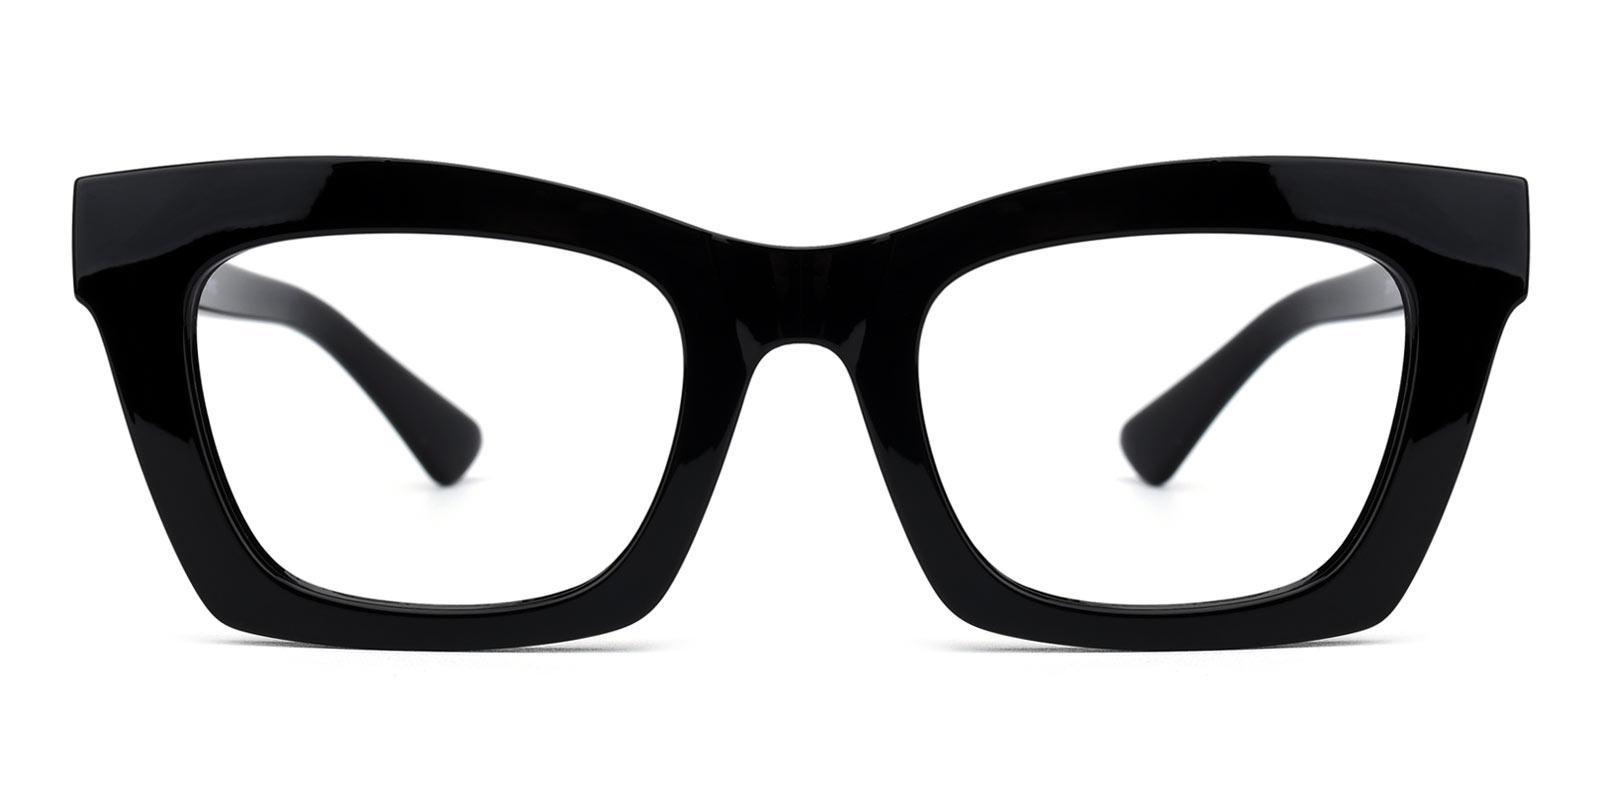 Catlady-Black-Cat-Acetate-Eyeglasses-detail